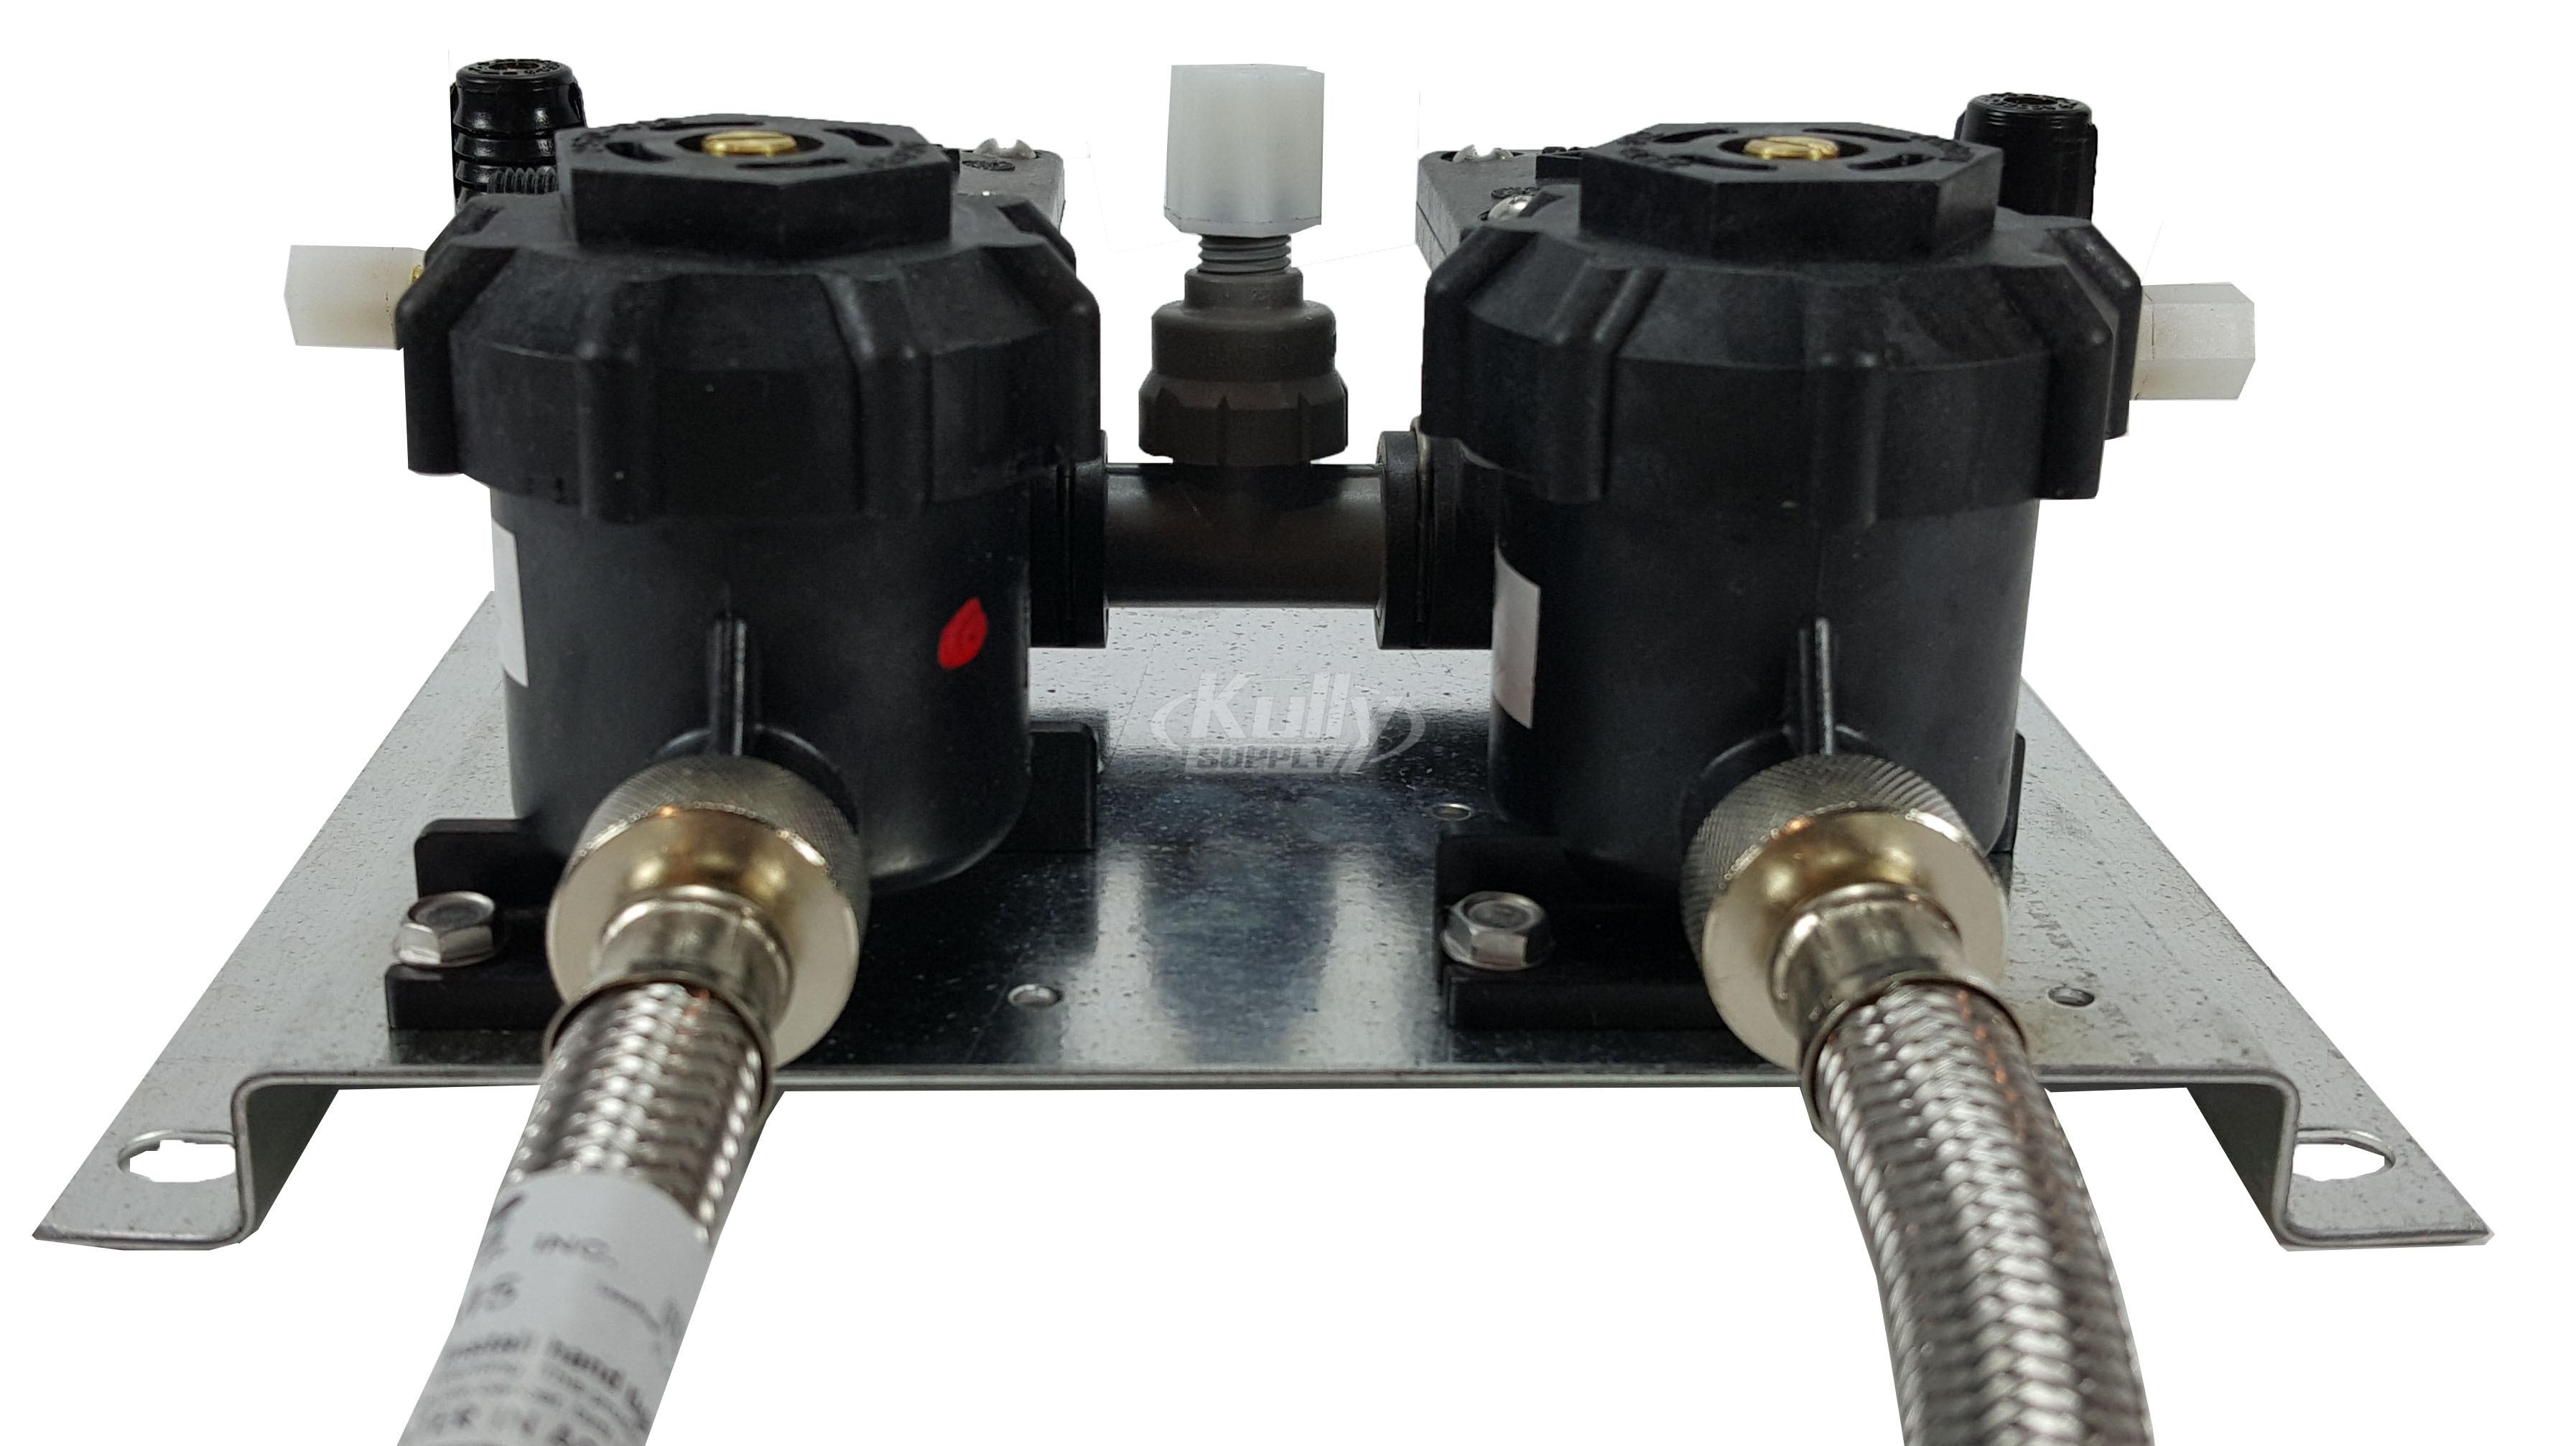 Acorn 2590-051-001 Air-Trol Metering Valve | KullySupply.com